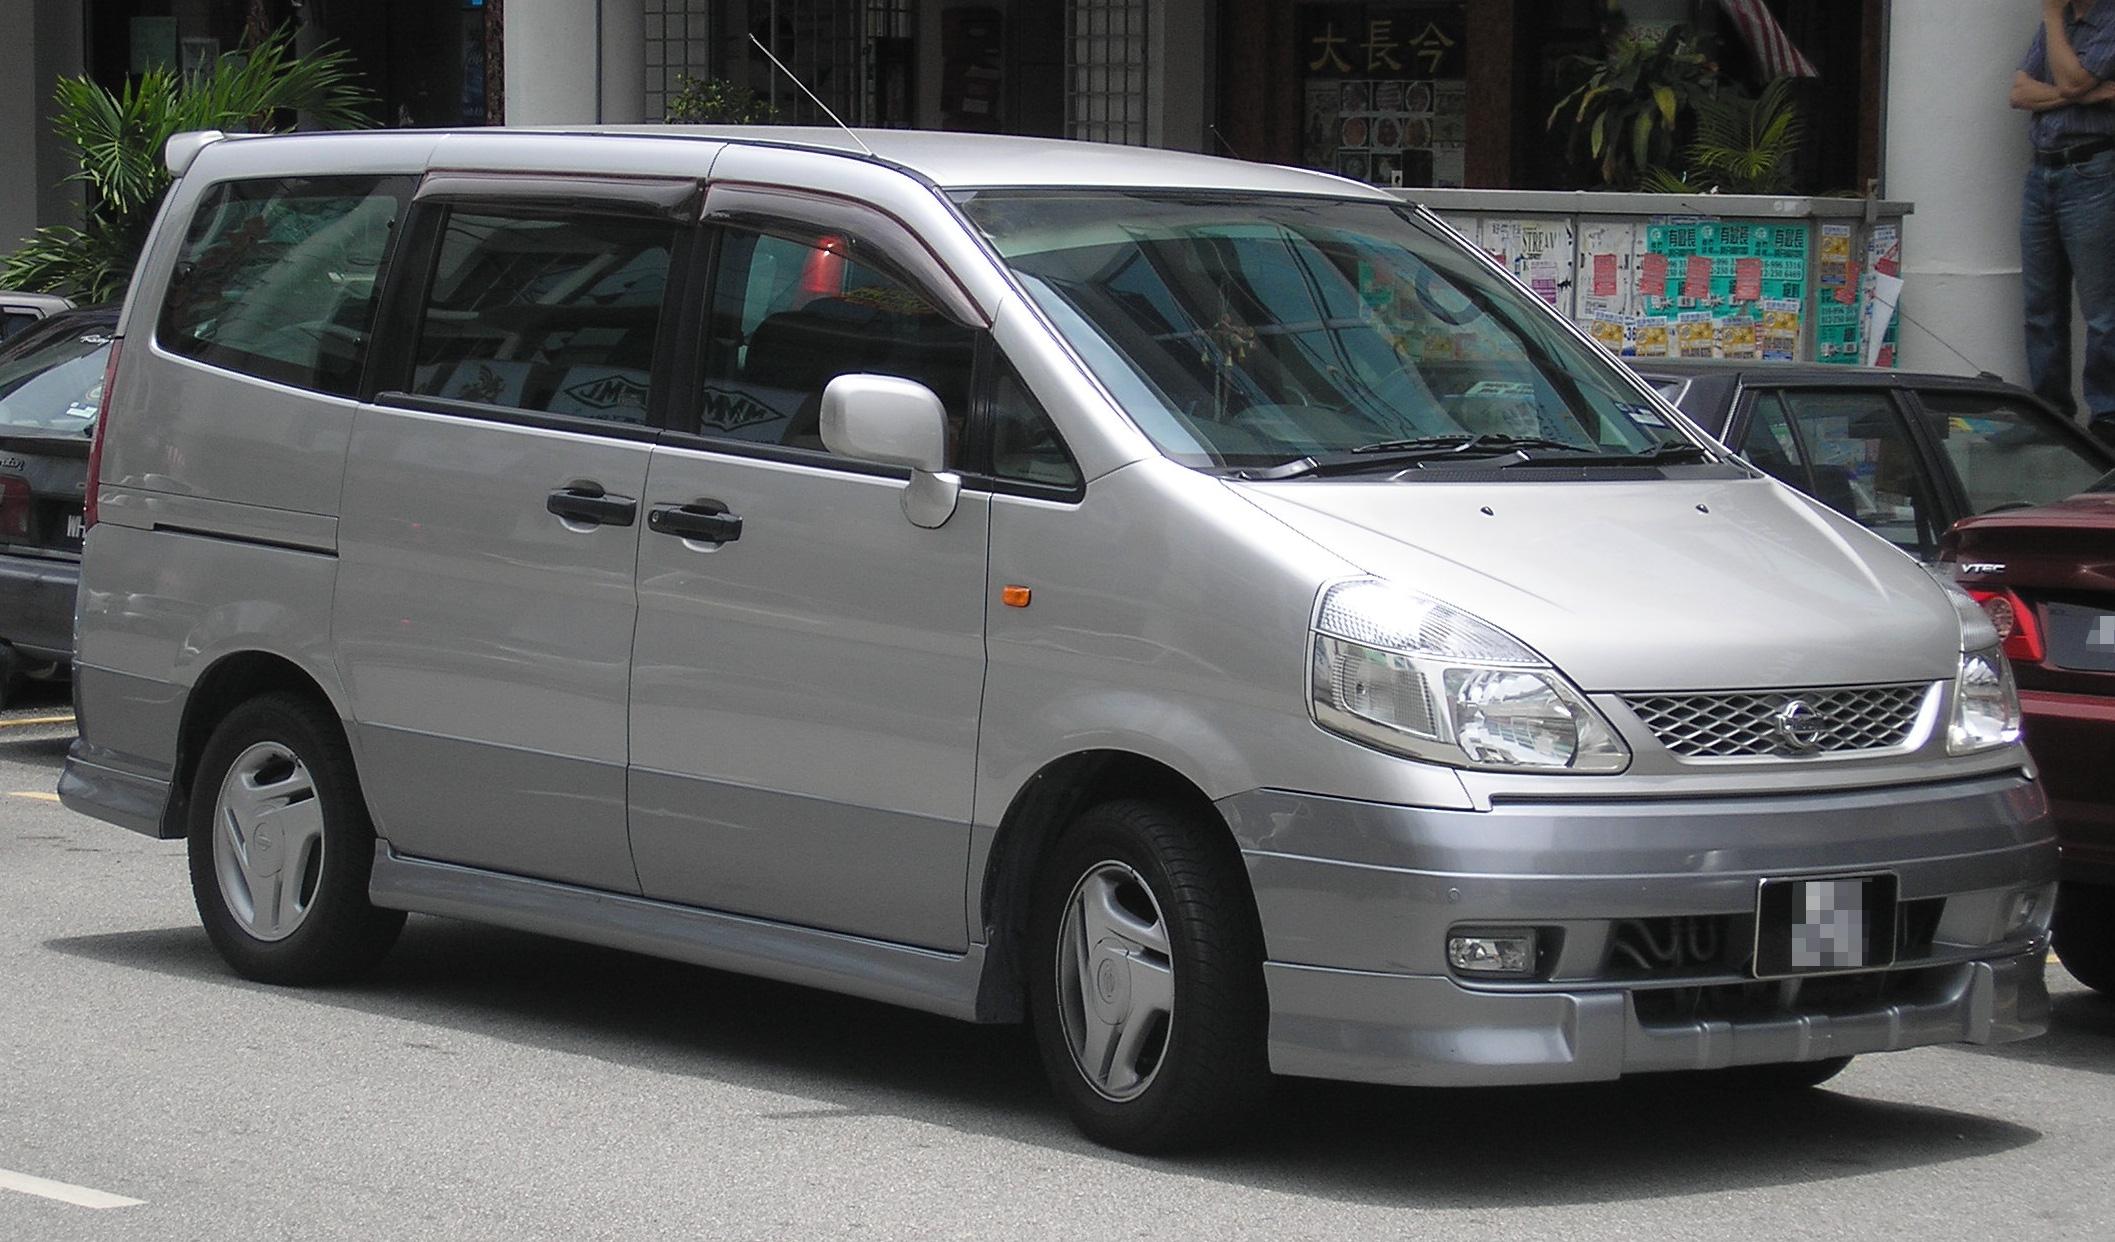 Nissan Serena I (C23) 1991 - 2002 Compact MPV #1